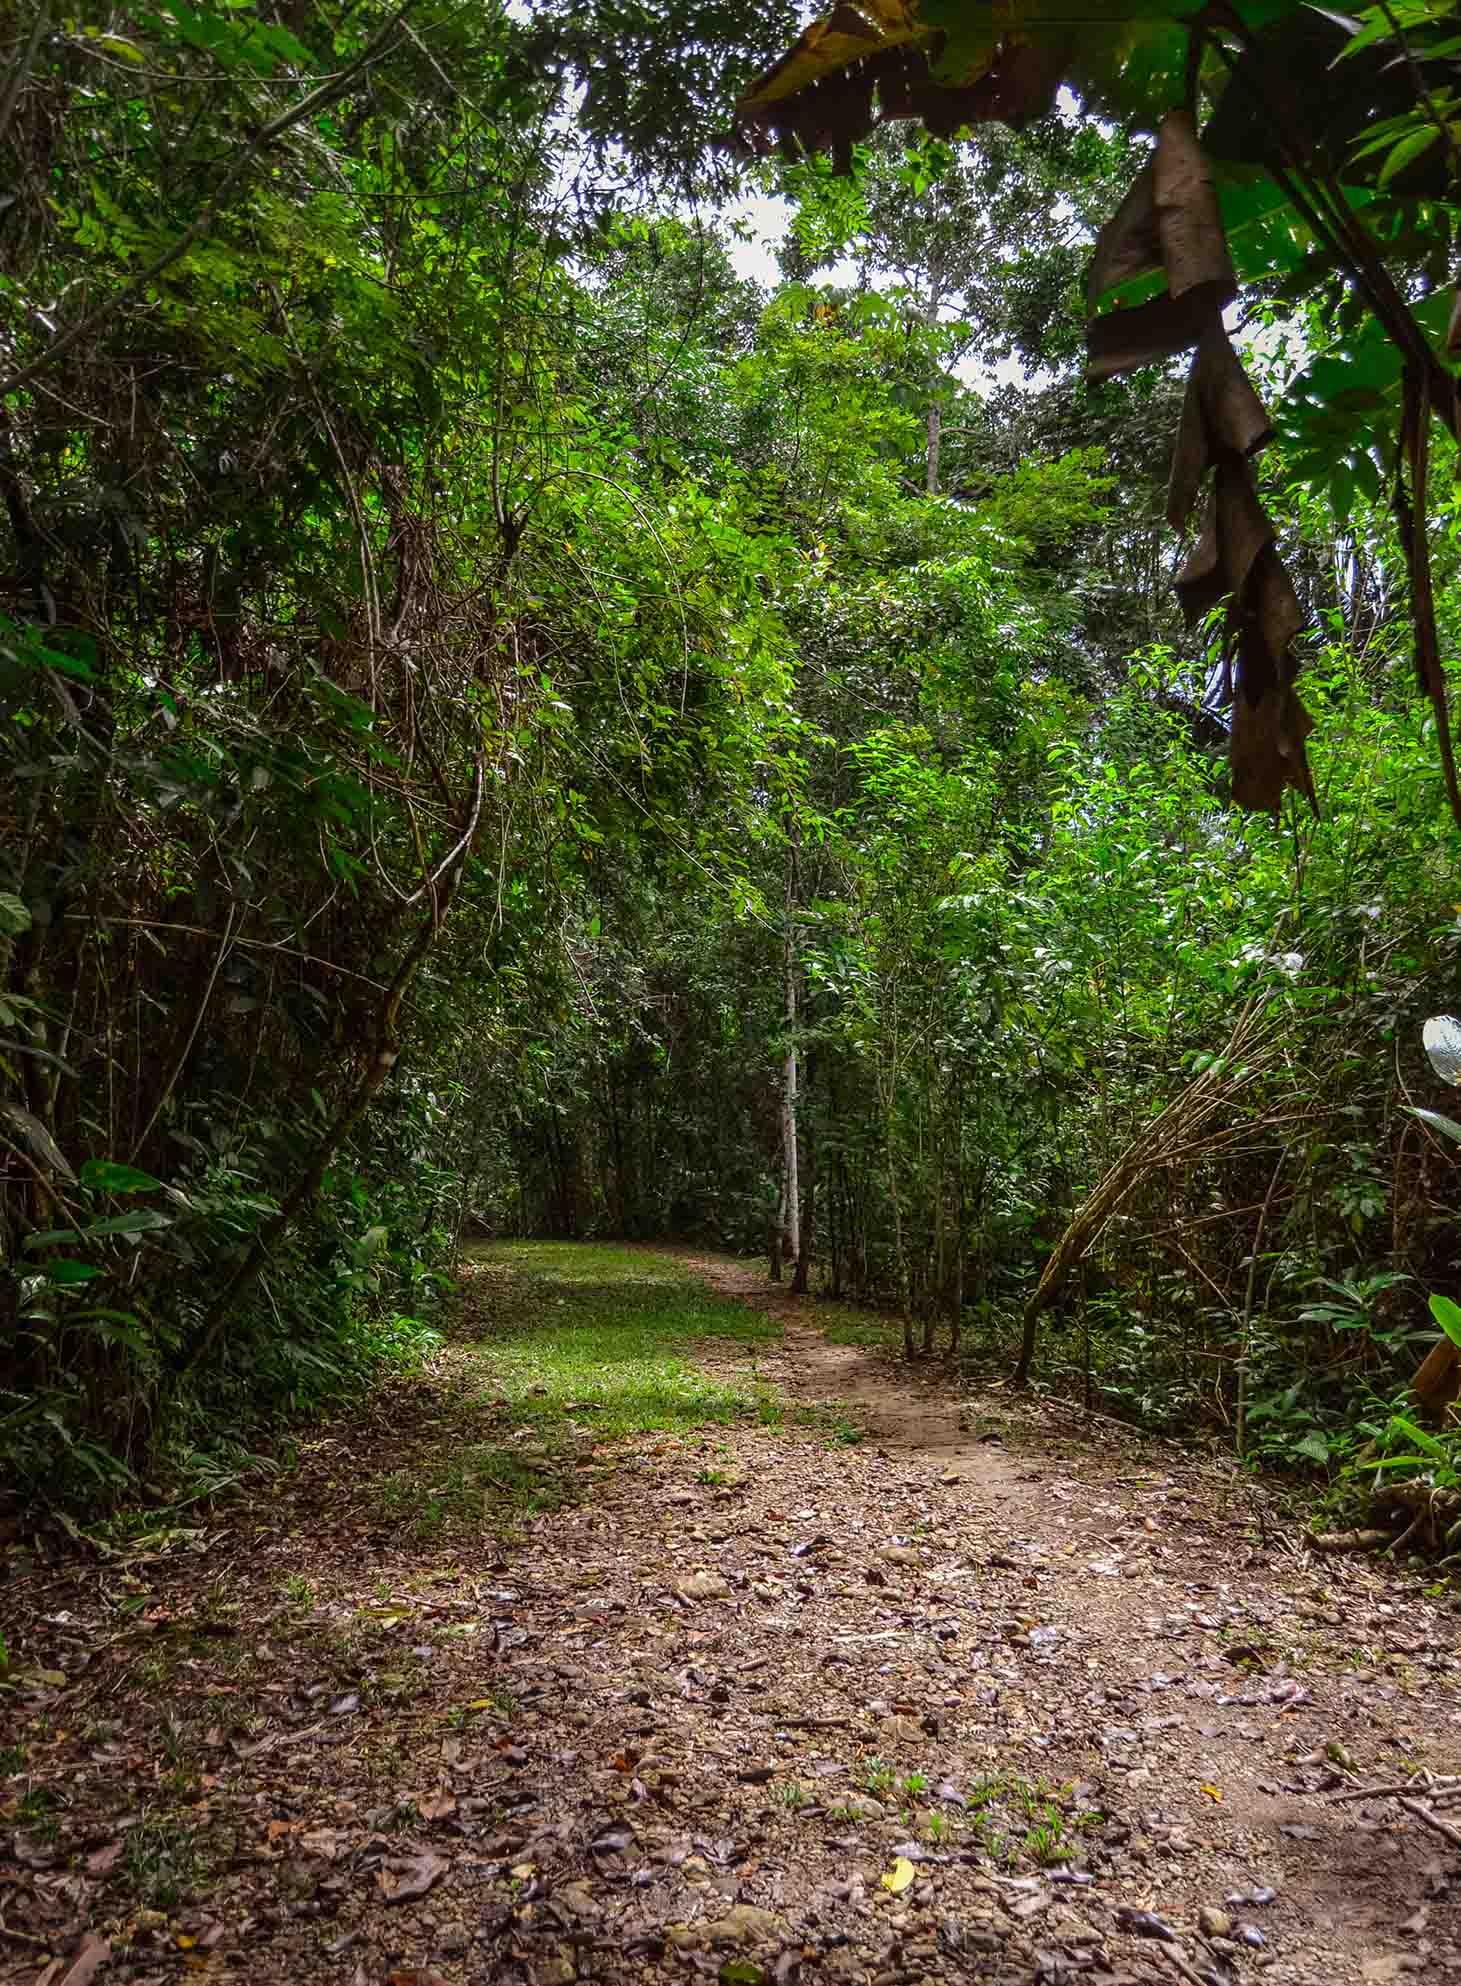 PG_Toledo_Colombia_nature_Rio_Blanco_National_Park_Hammock_Bridge_Waterfall_Belize_Nature_trail